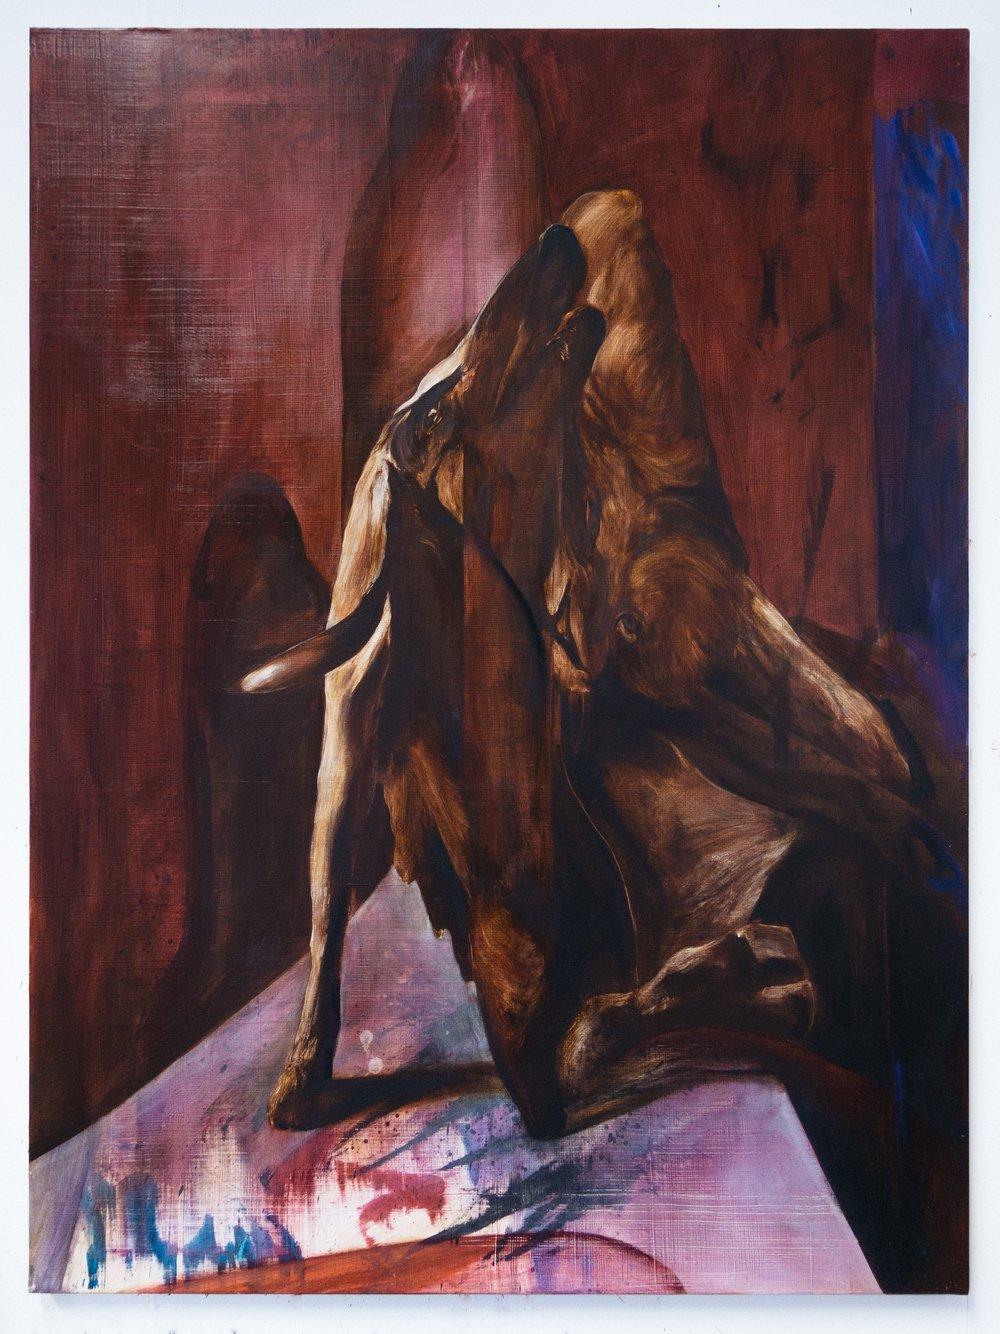 Diptych pt. 2: Virtue , 2017  Oil on canvas  120 x 100 cm